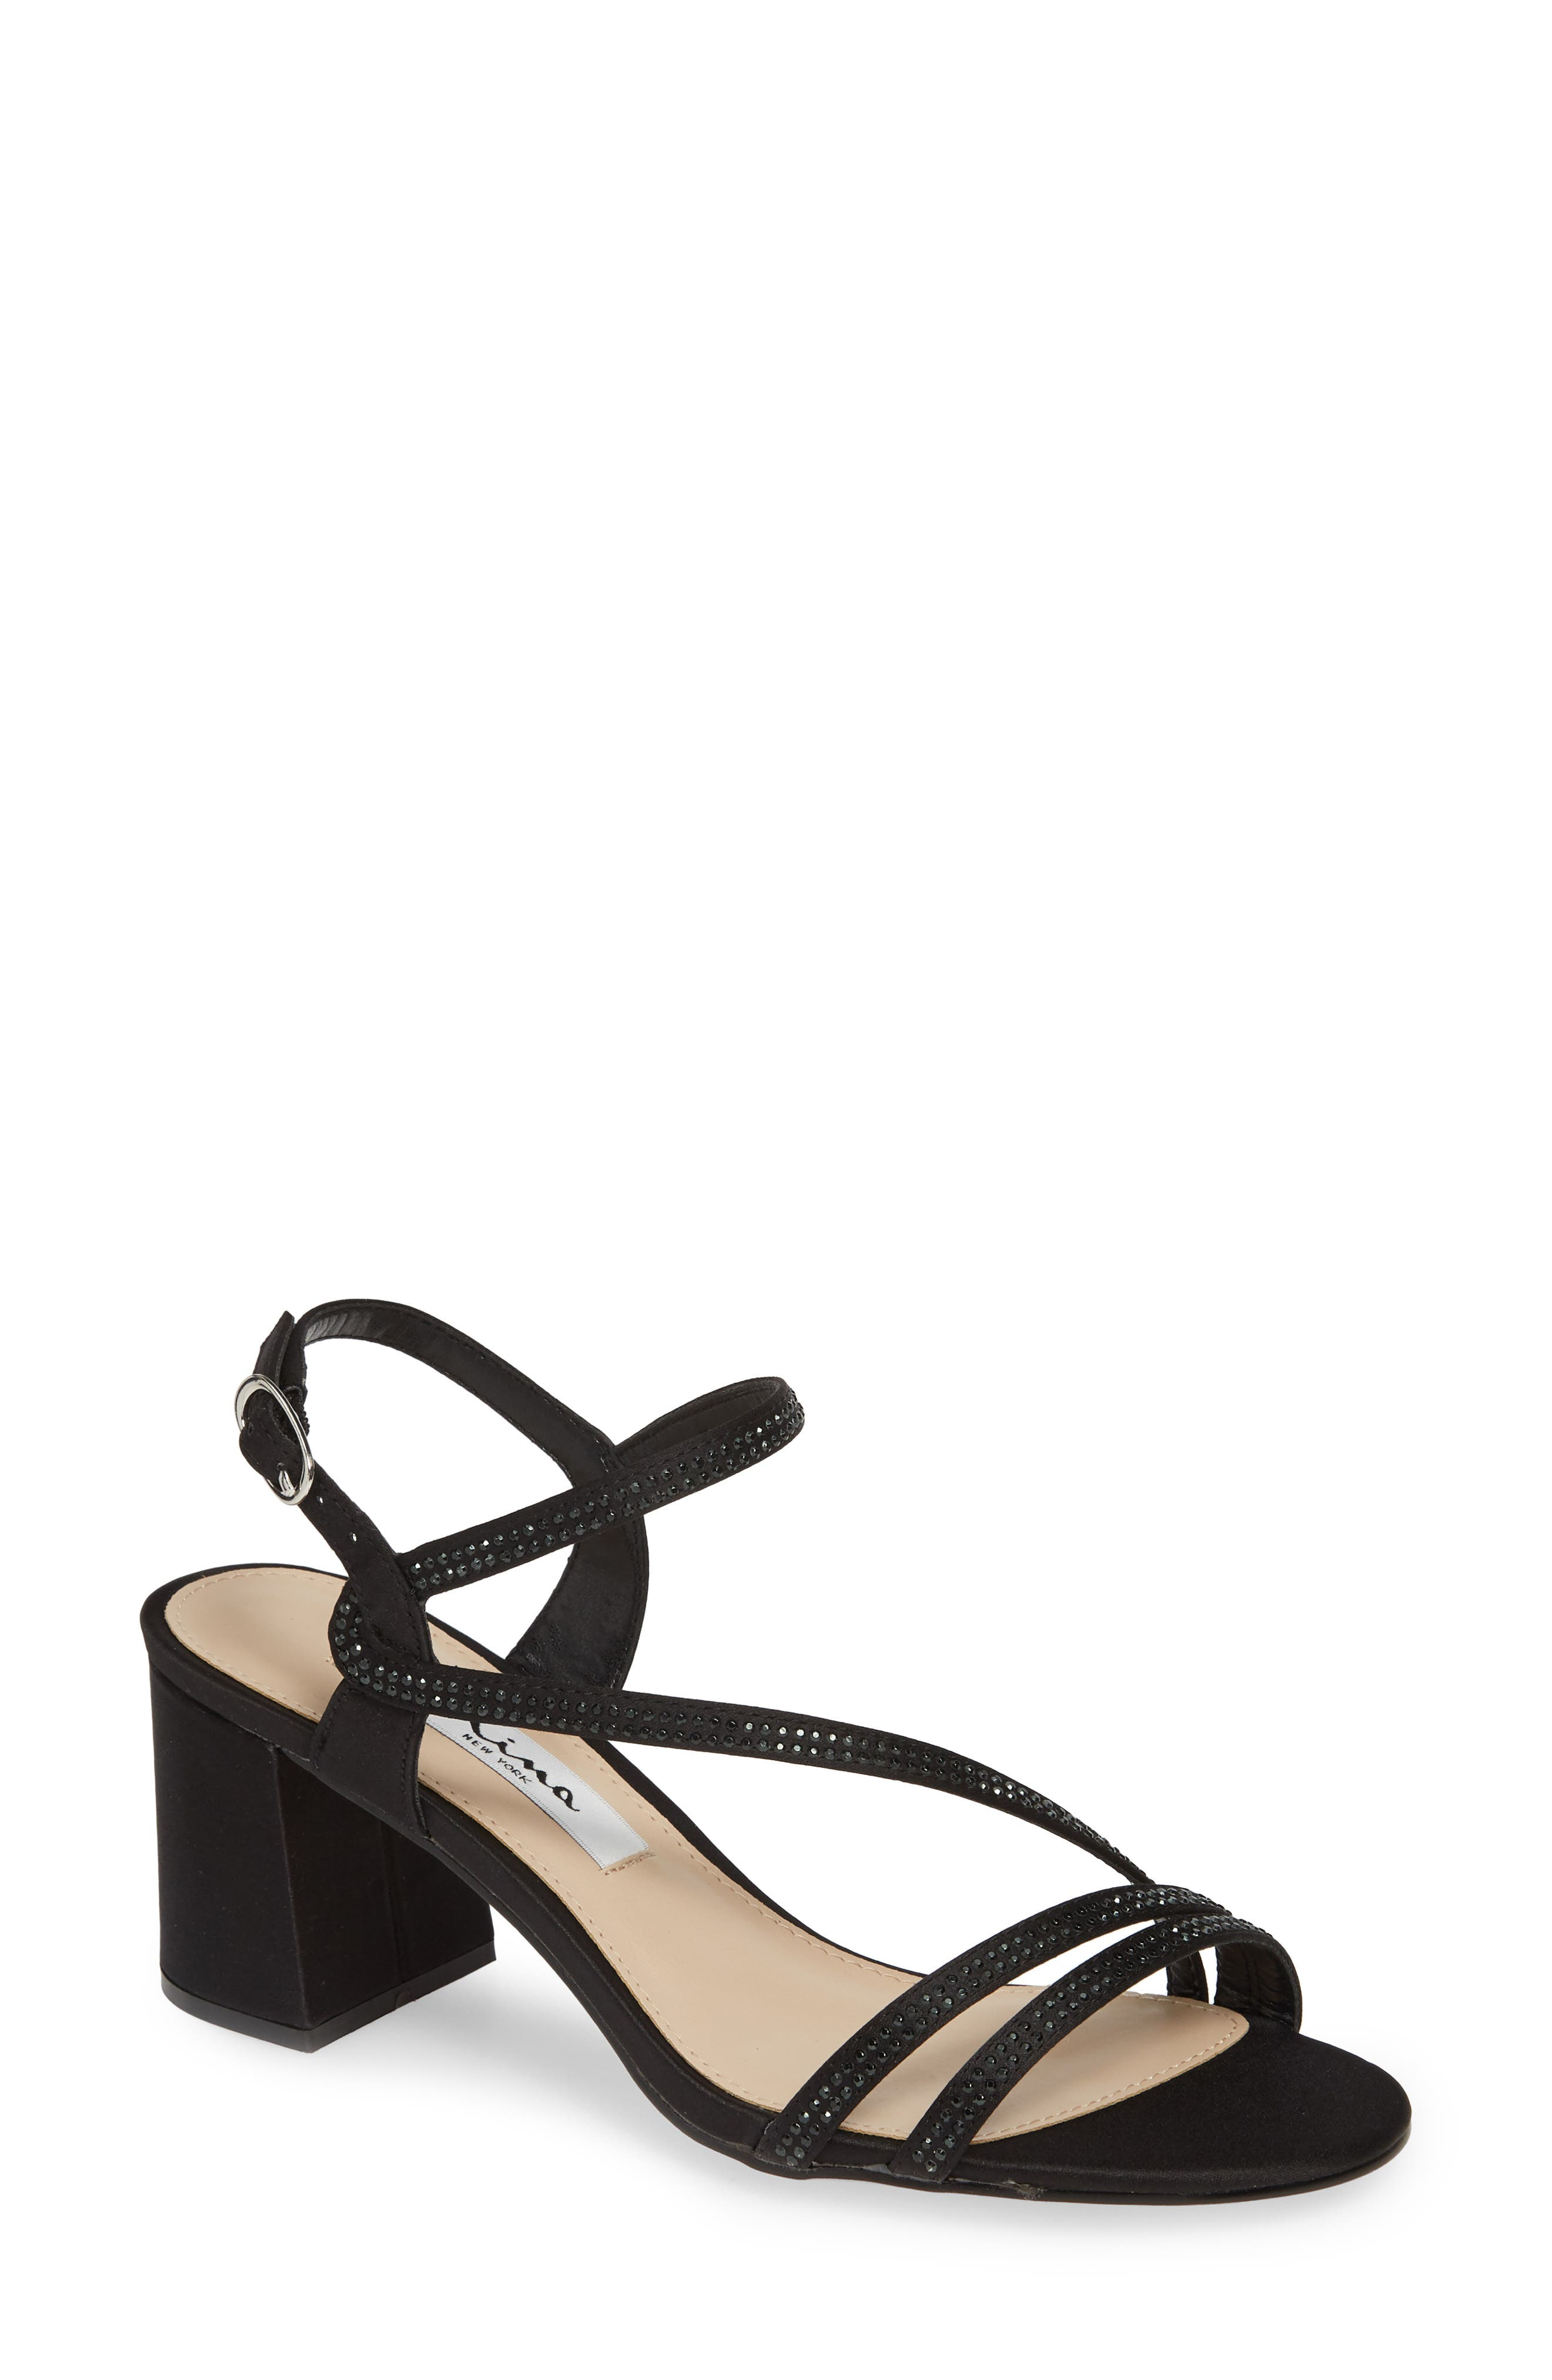 NINA Naura Block Heel Sandal, Main, color, BLACK SATIN